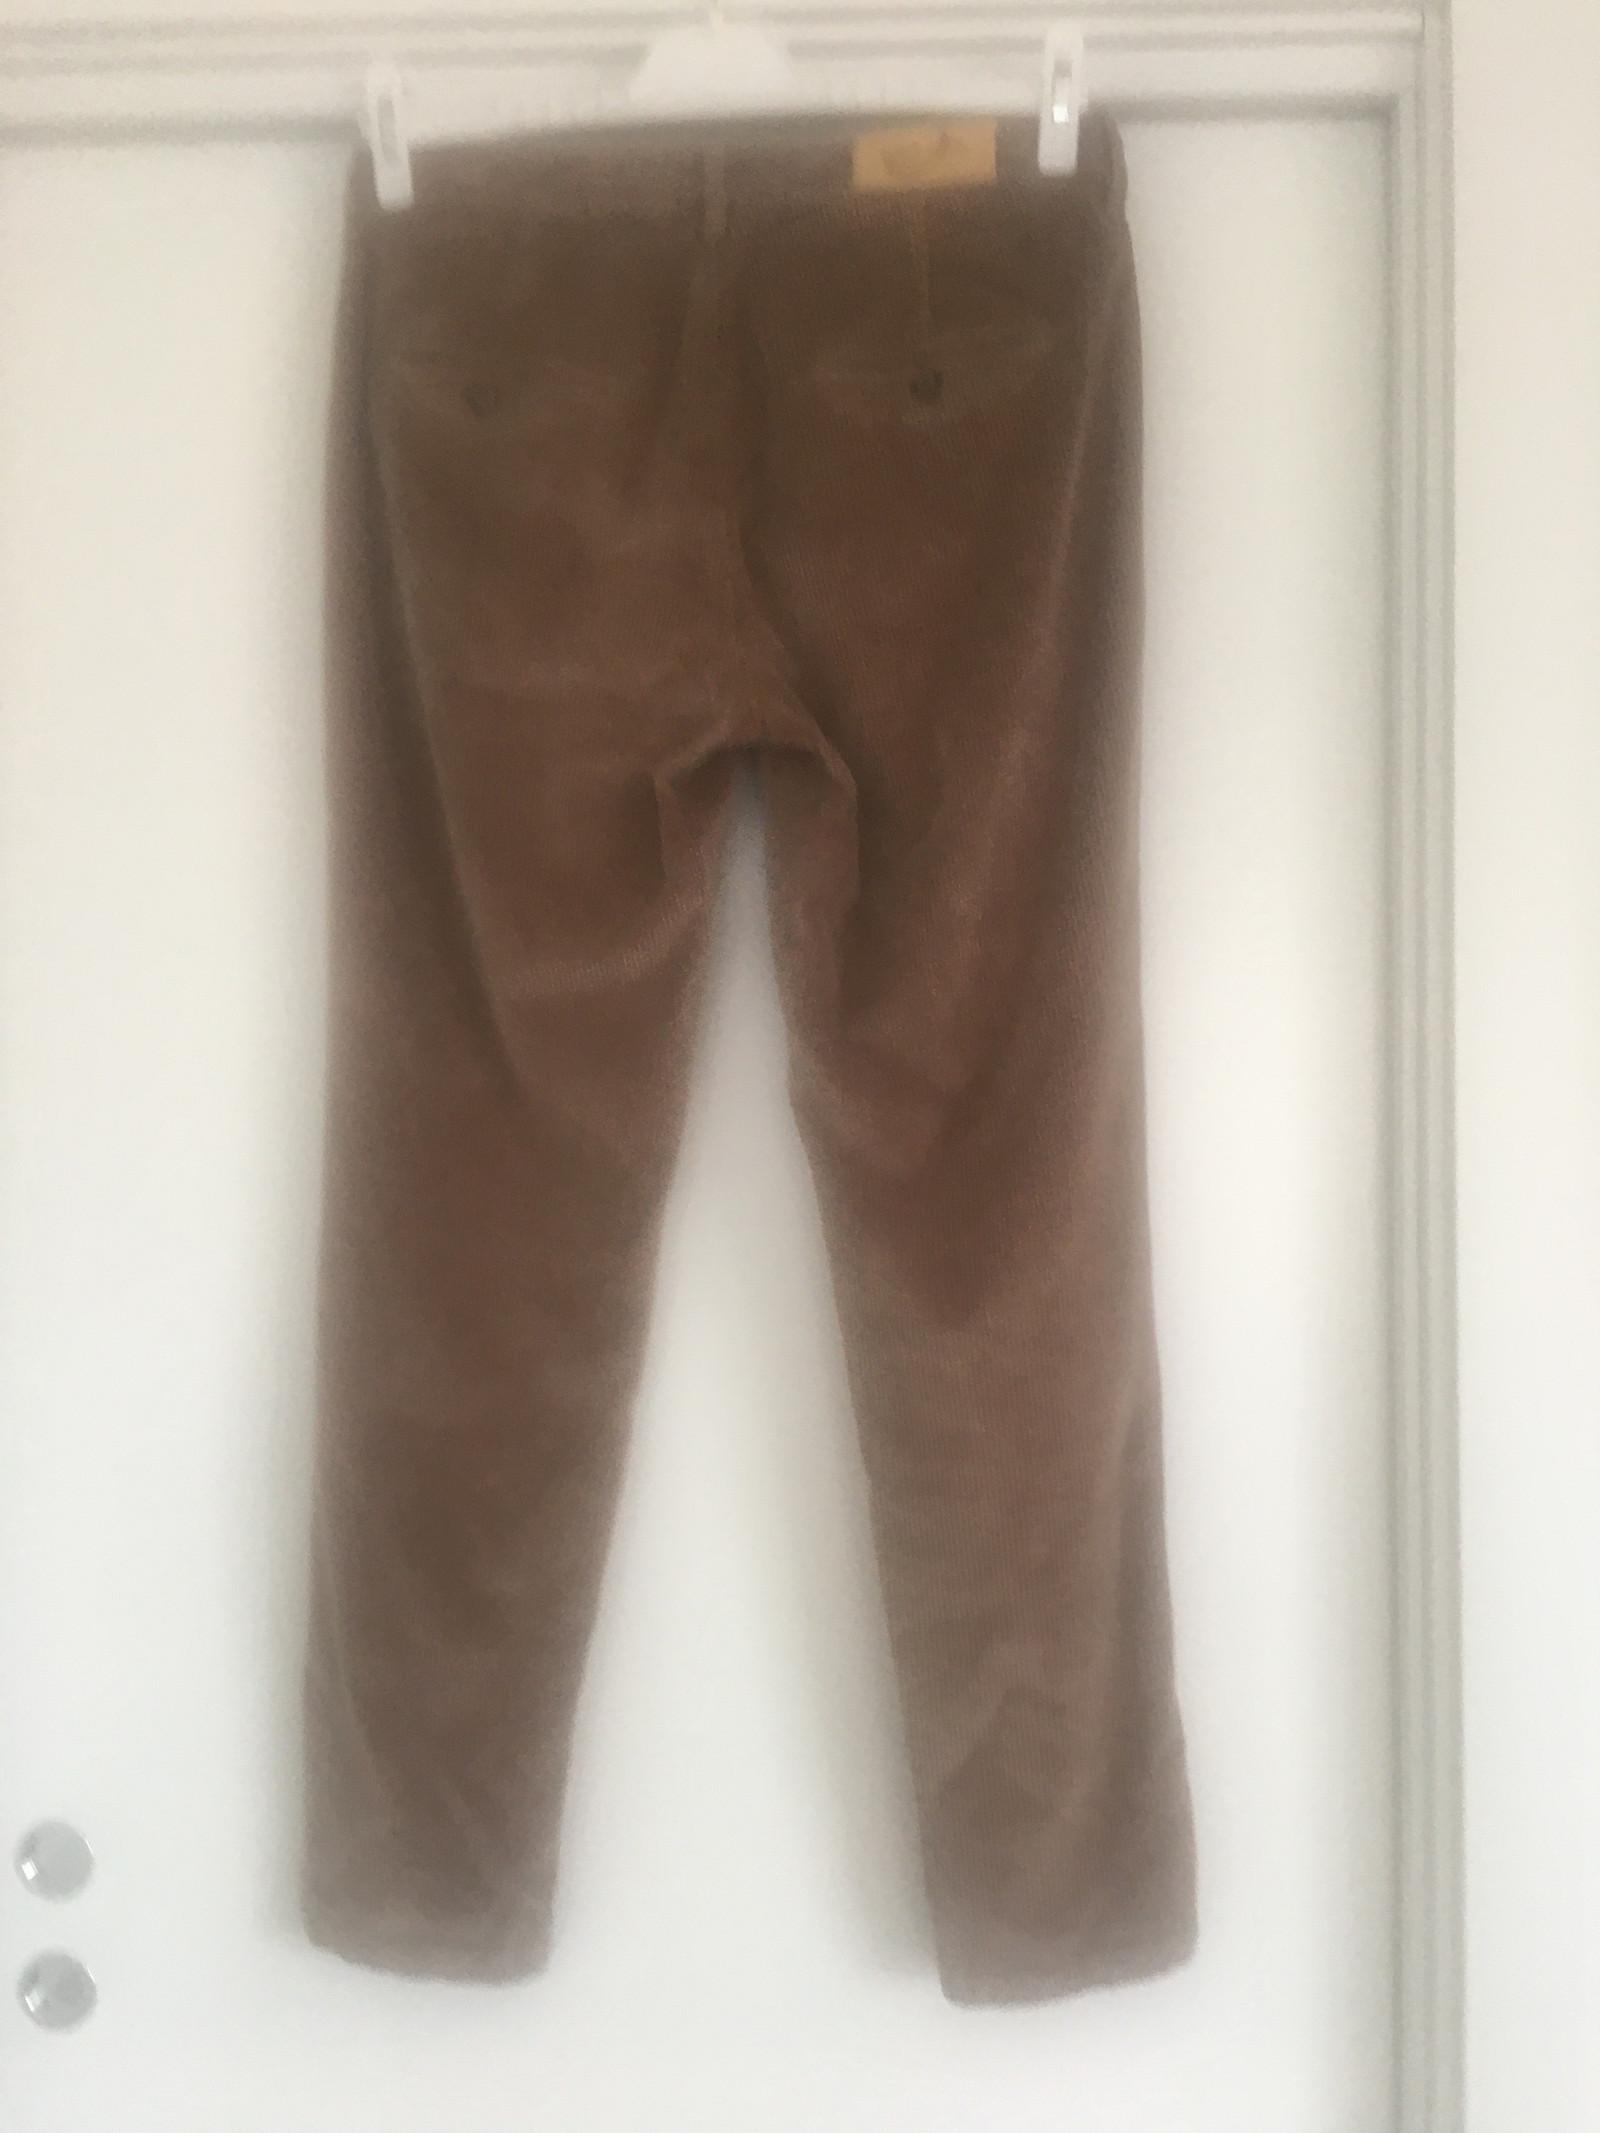 Bukse i cordfløyel fra Jacob Cohen, str 30 måler 82 cm i